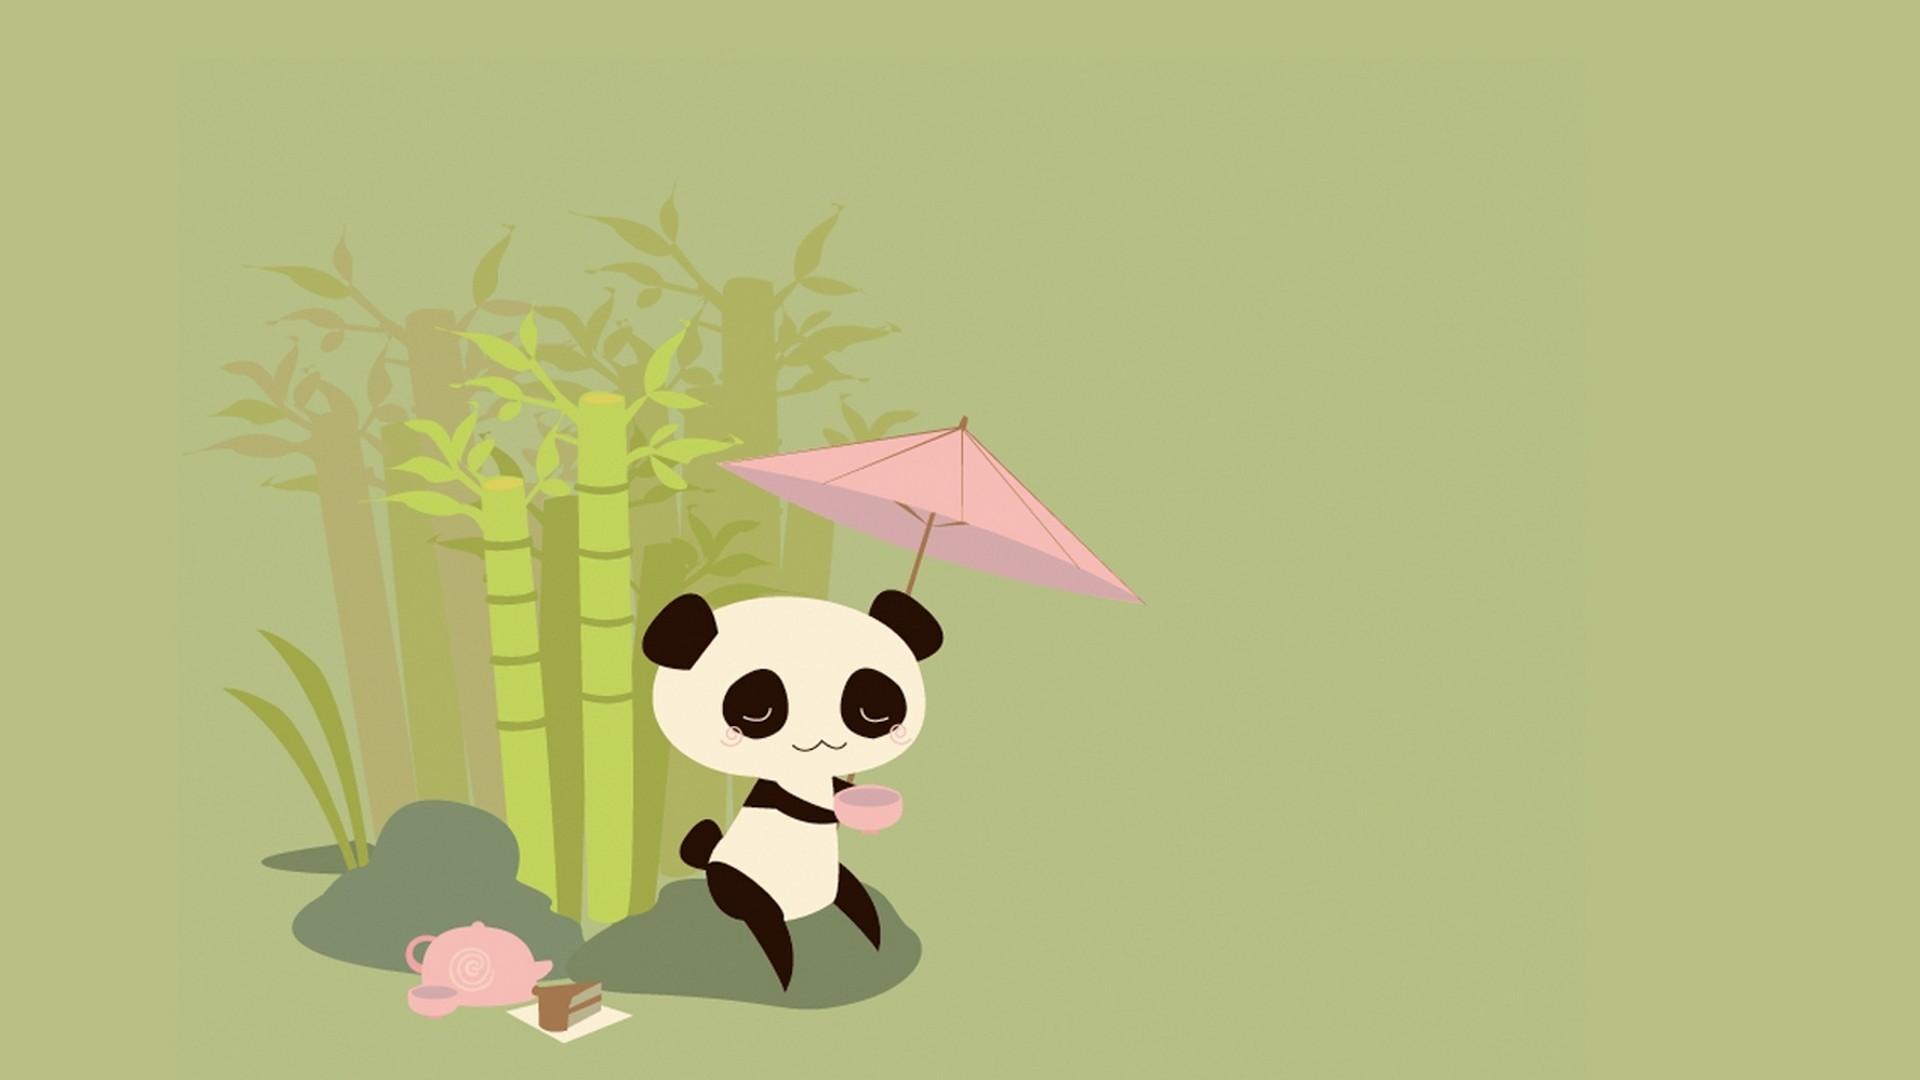 Animated Christmas Wallpaper For Android Cute Panda Drawing Wallpaper 2018 Cute Screensavers